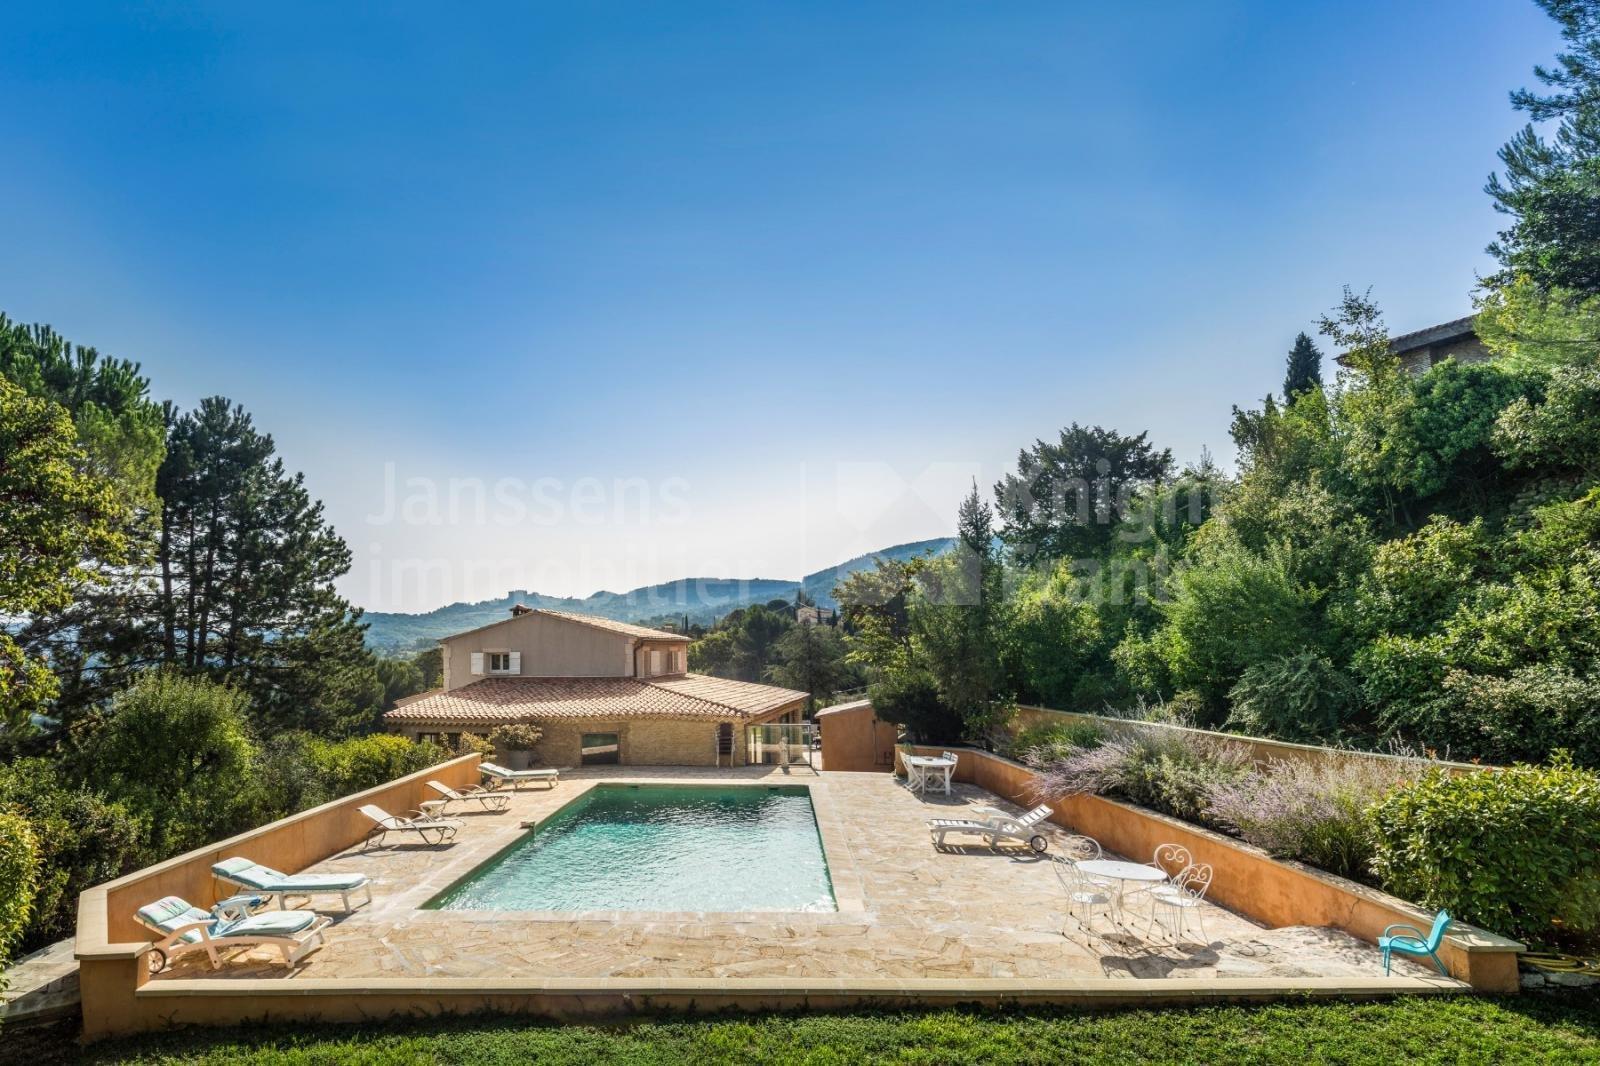 Villa in Apt, Provence-Alpes-Côte d'Azur, France 1